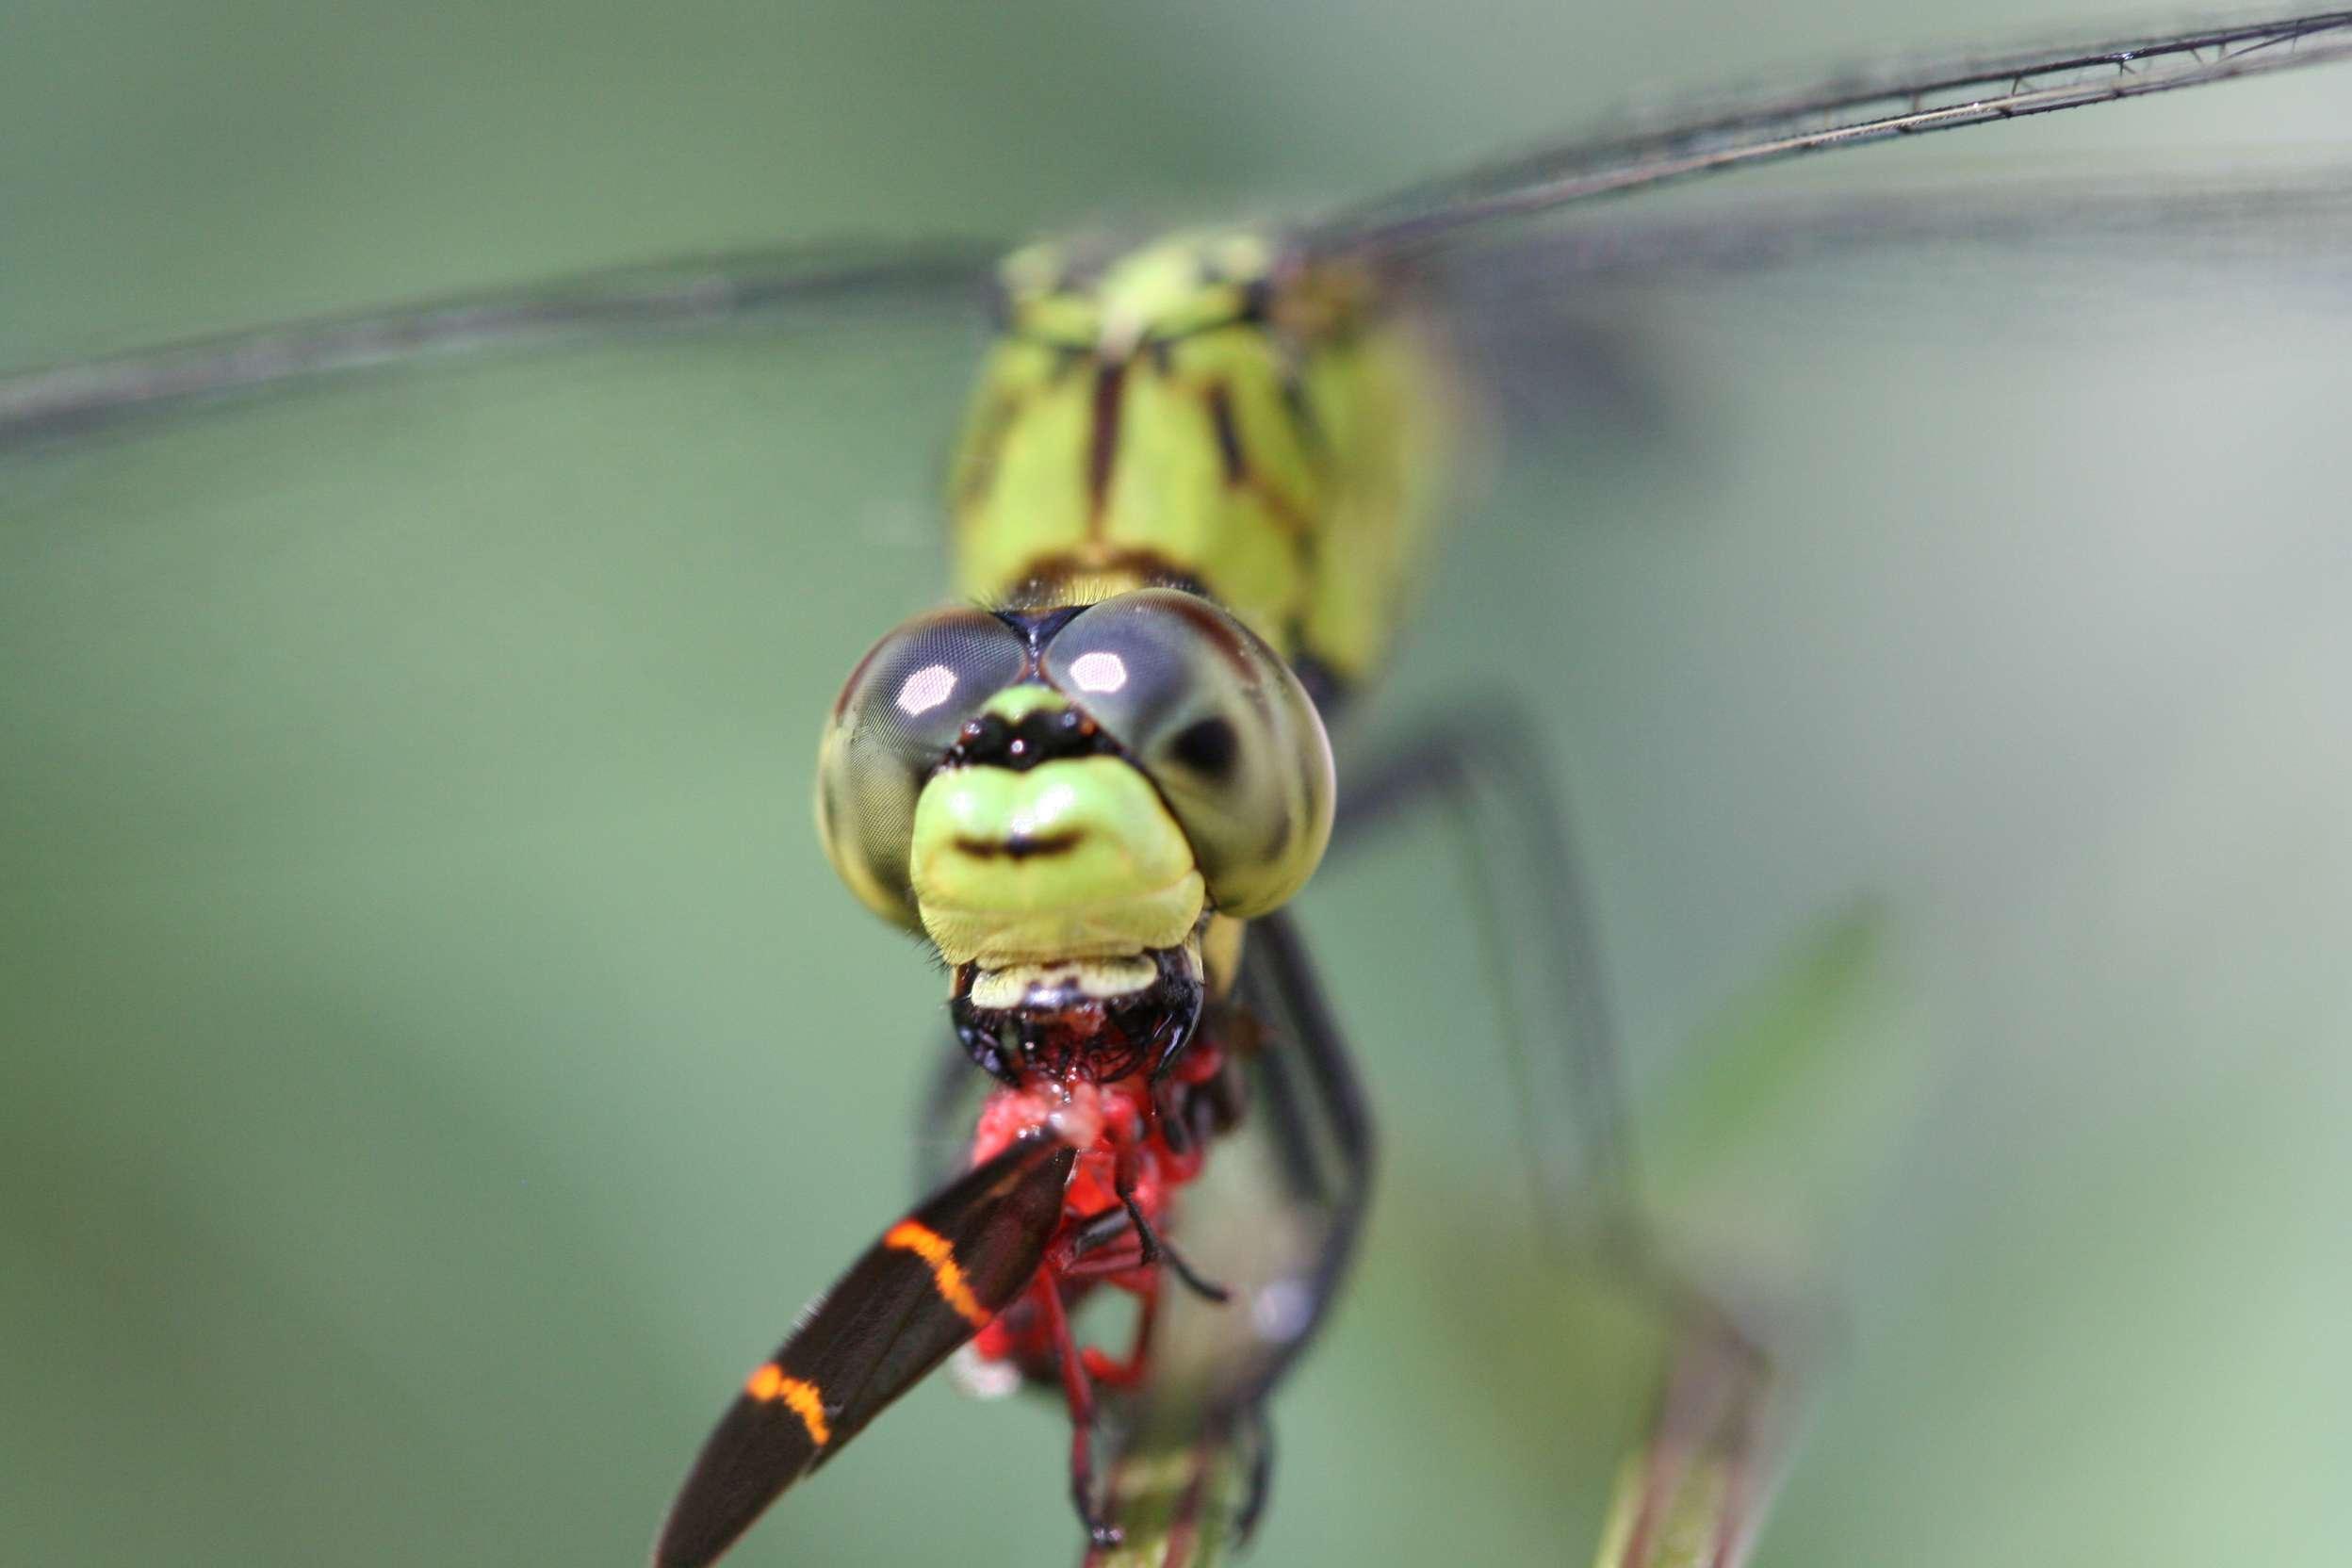 dragonfly eating a spittlebug, aka froghopper